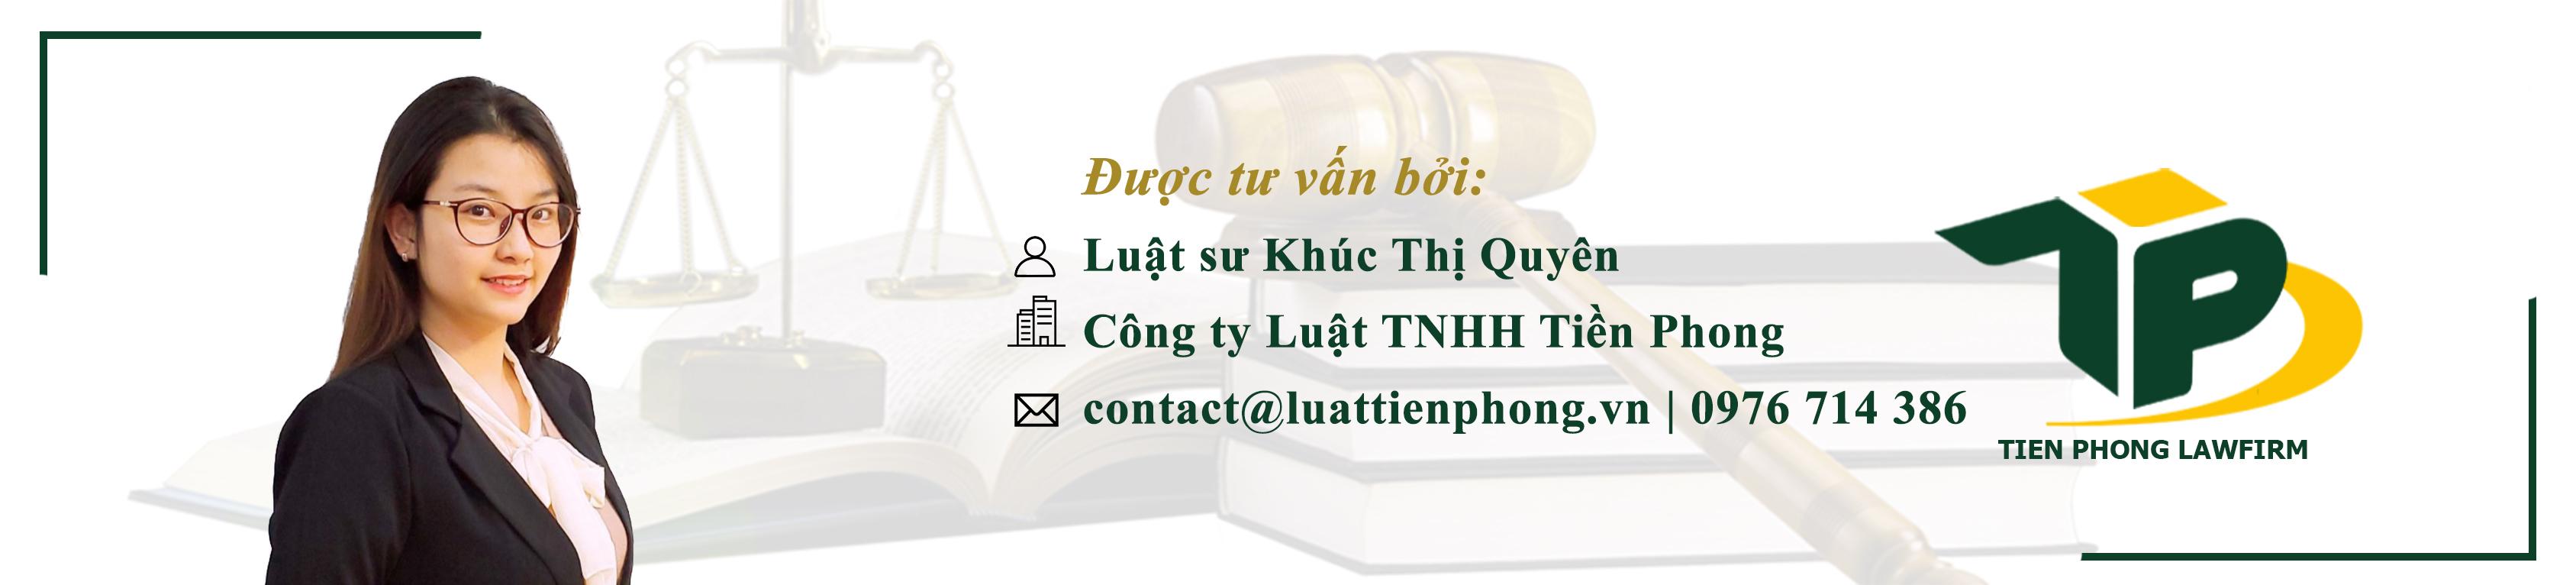 Luat su Khuc Thi Quyen